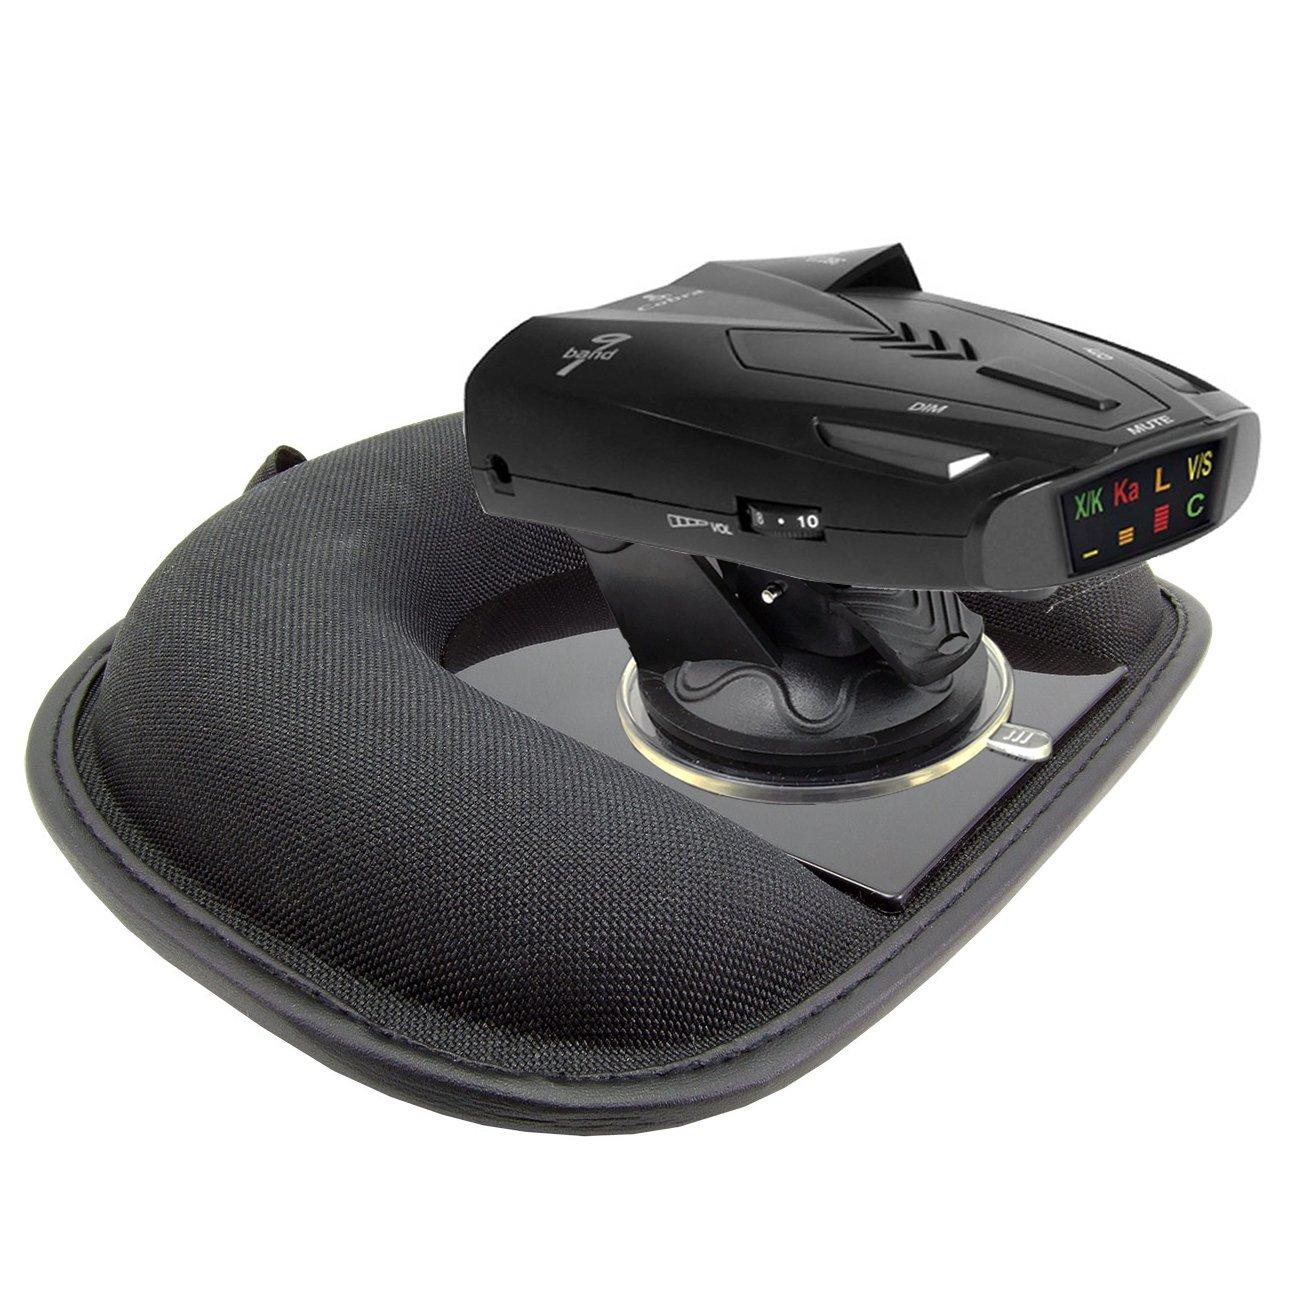 AccessoryBasics Car Dashboard Platform Beanbag & Suction Cup Mount for Radar Detector Escort Passport 8500x50 9500 Max S55 X80 Redline EX iX S3 S4 Beltronics Uniden R3 Whistler Cobra ESD XRS SPX by ChargerCity (Image #2)